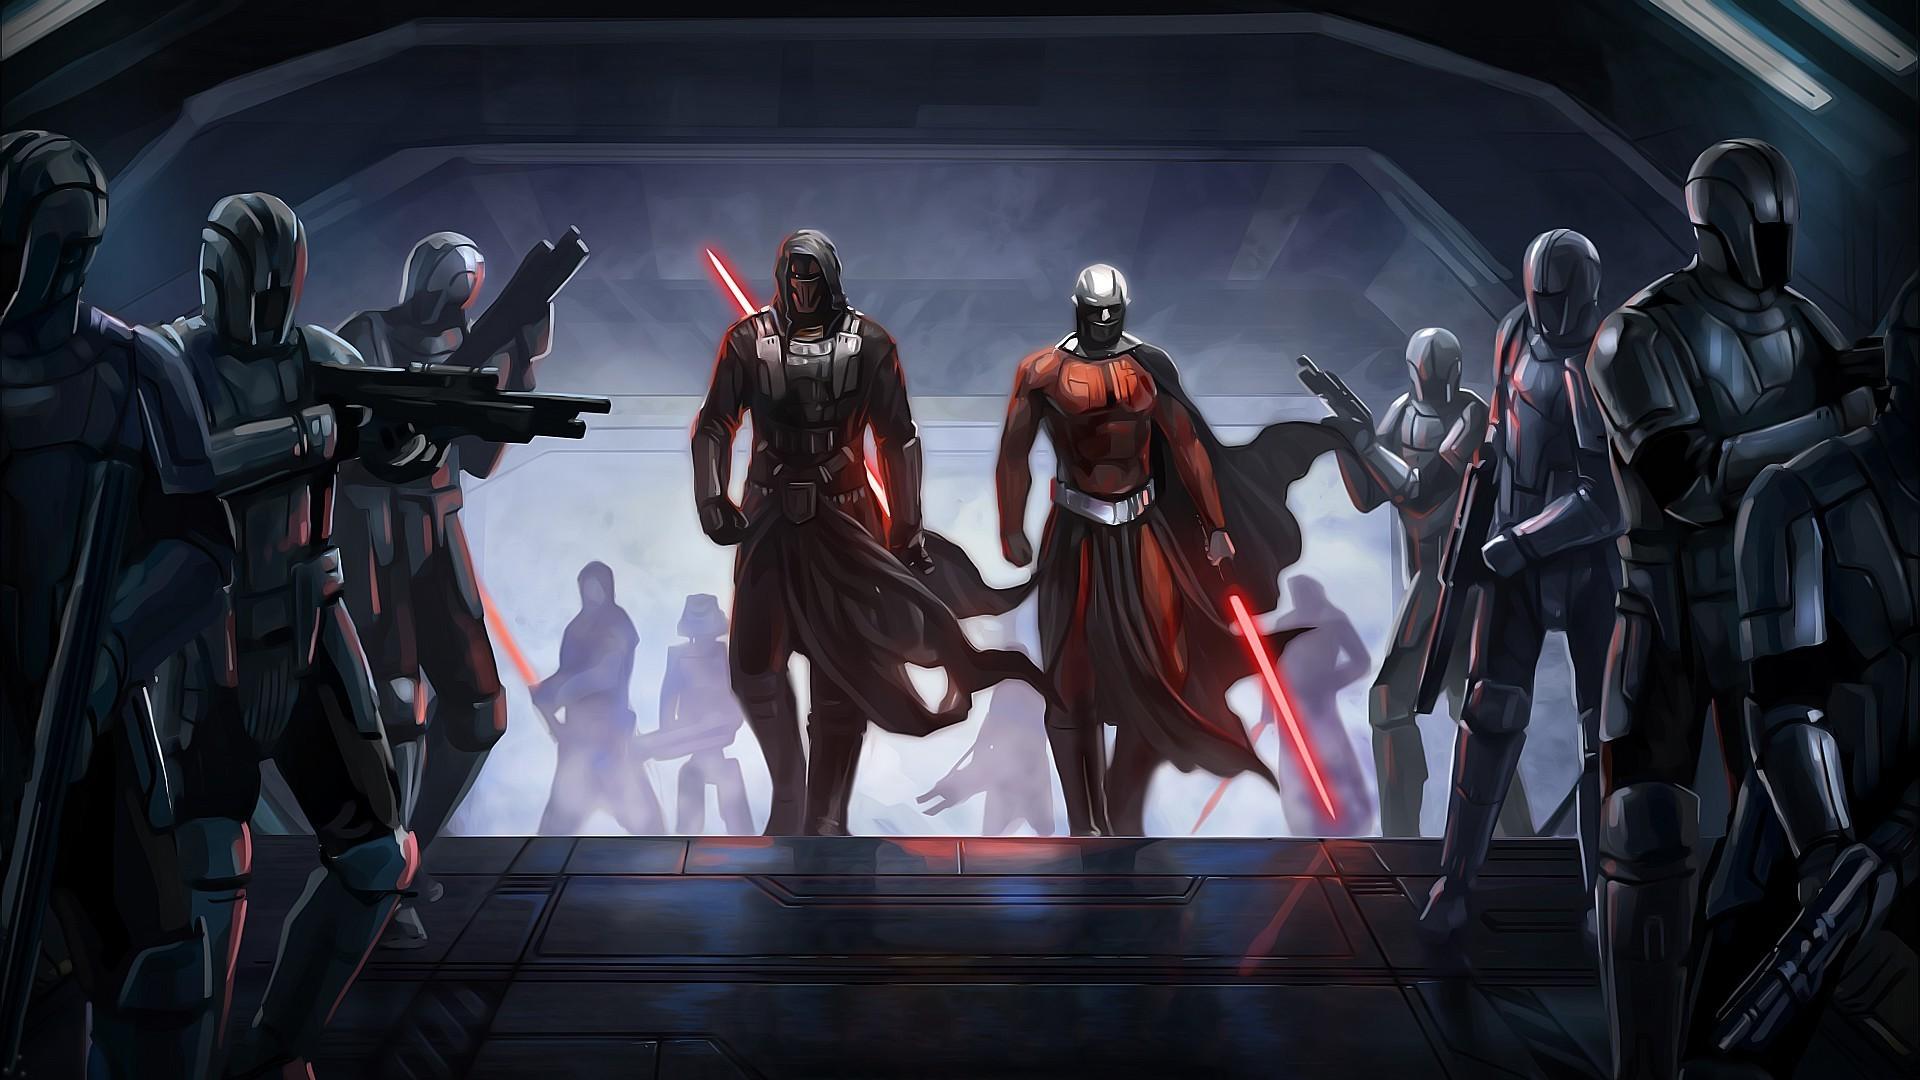 Star Wars Wallpapers (9)